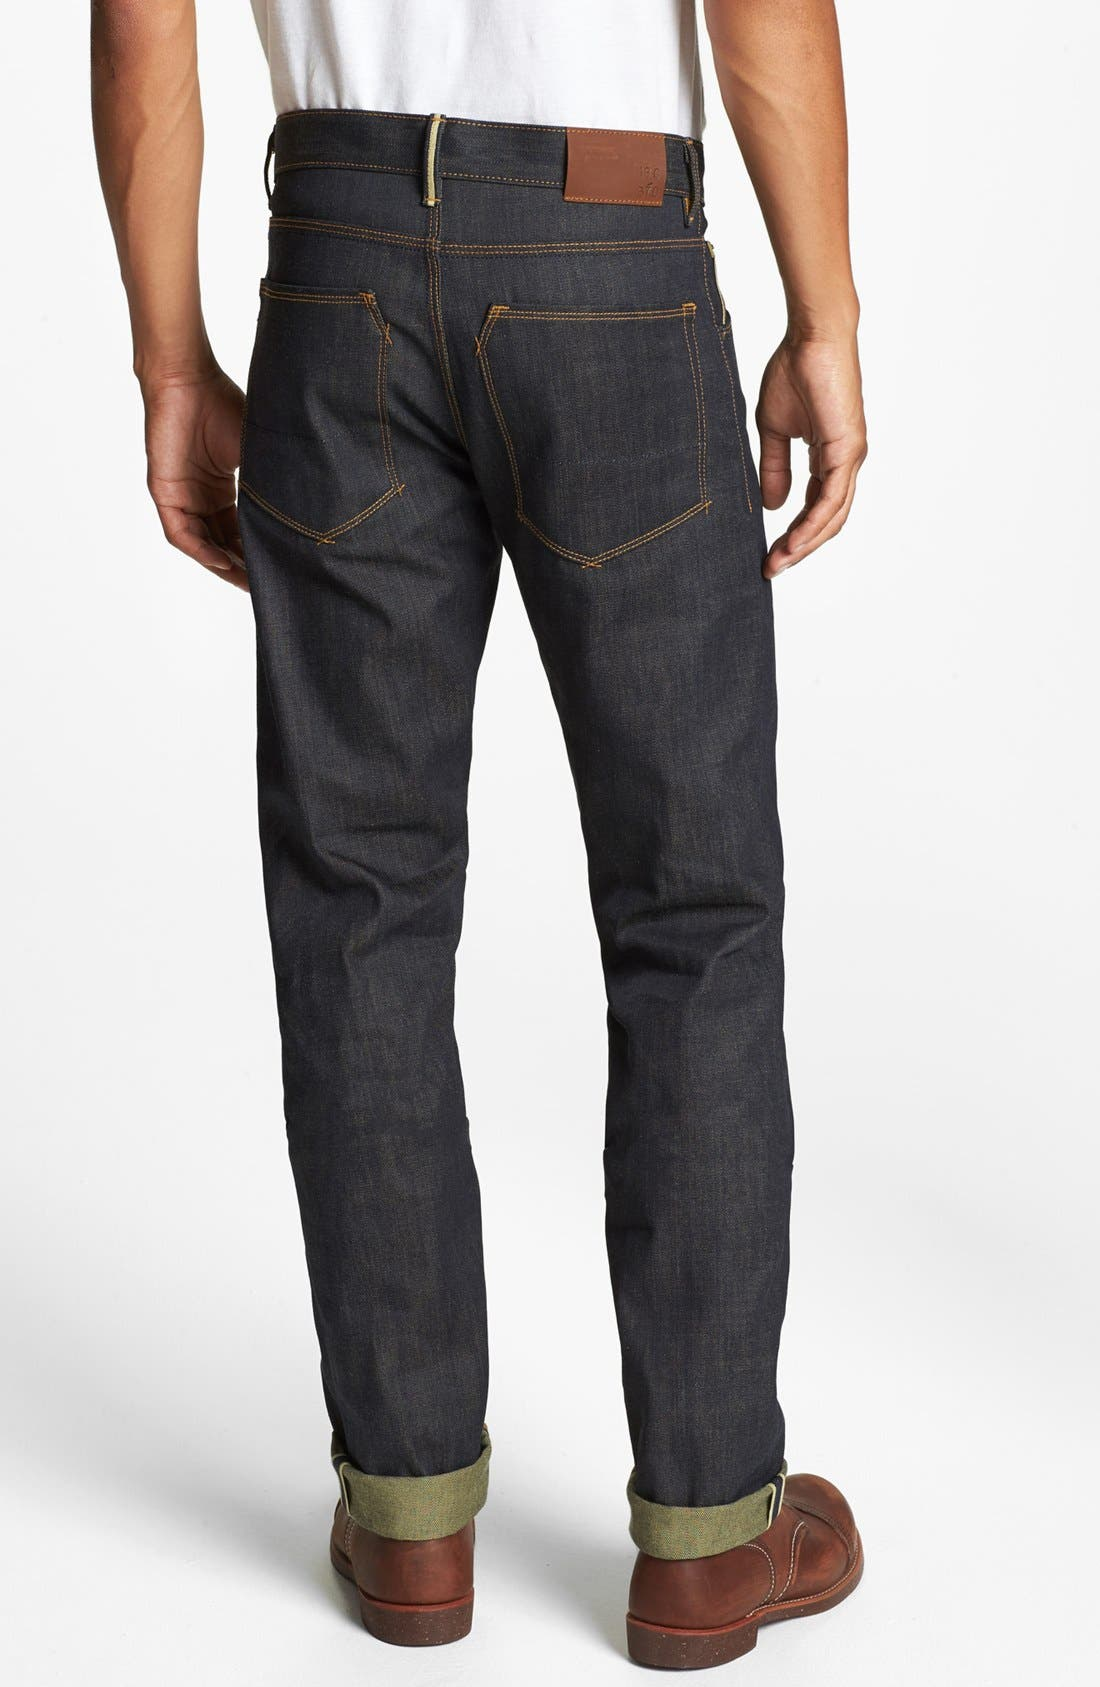 Alternate Image 1 Selected - Raleigh Denim 'Jones' Slim Fit Raw Selvedge Jeans (Original Selvage)